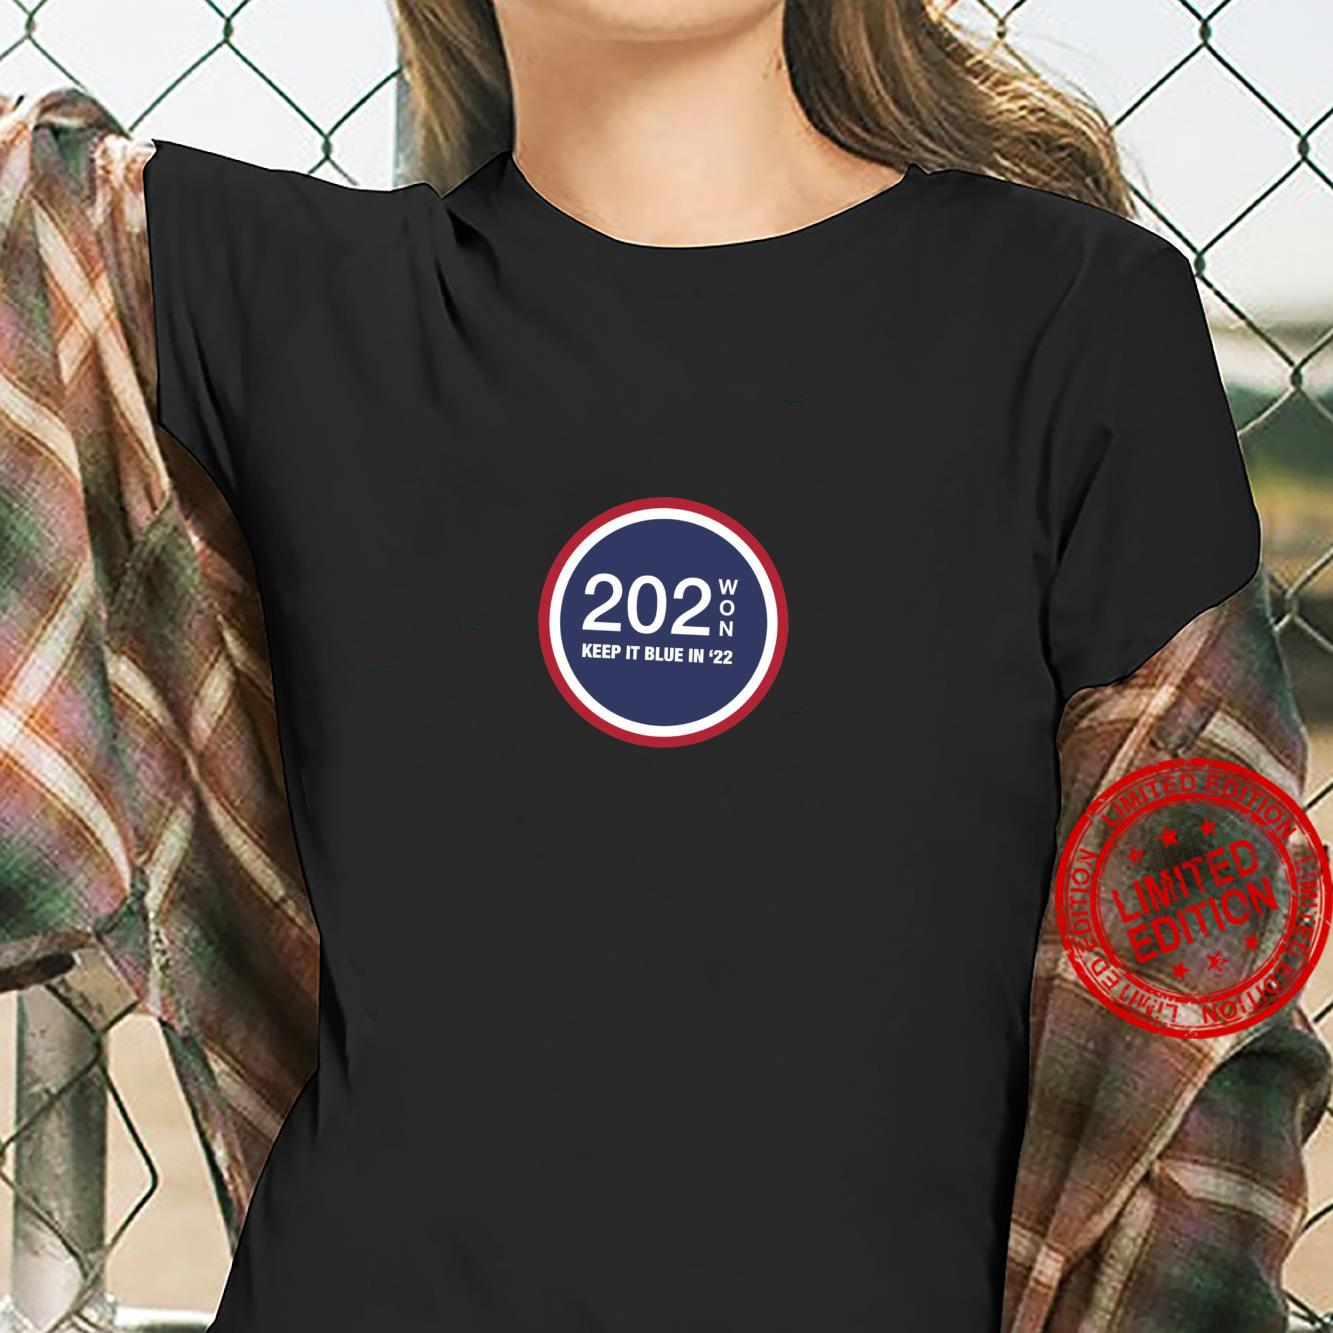 202WON, KEEP IT BLUE IN '22 Shirt ladies tee